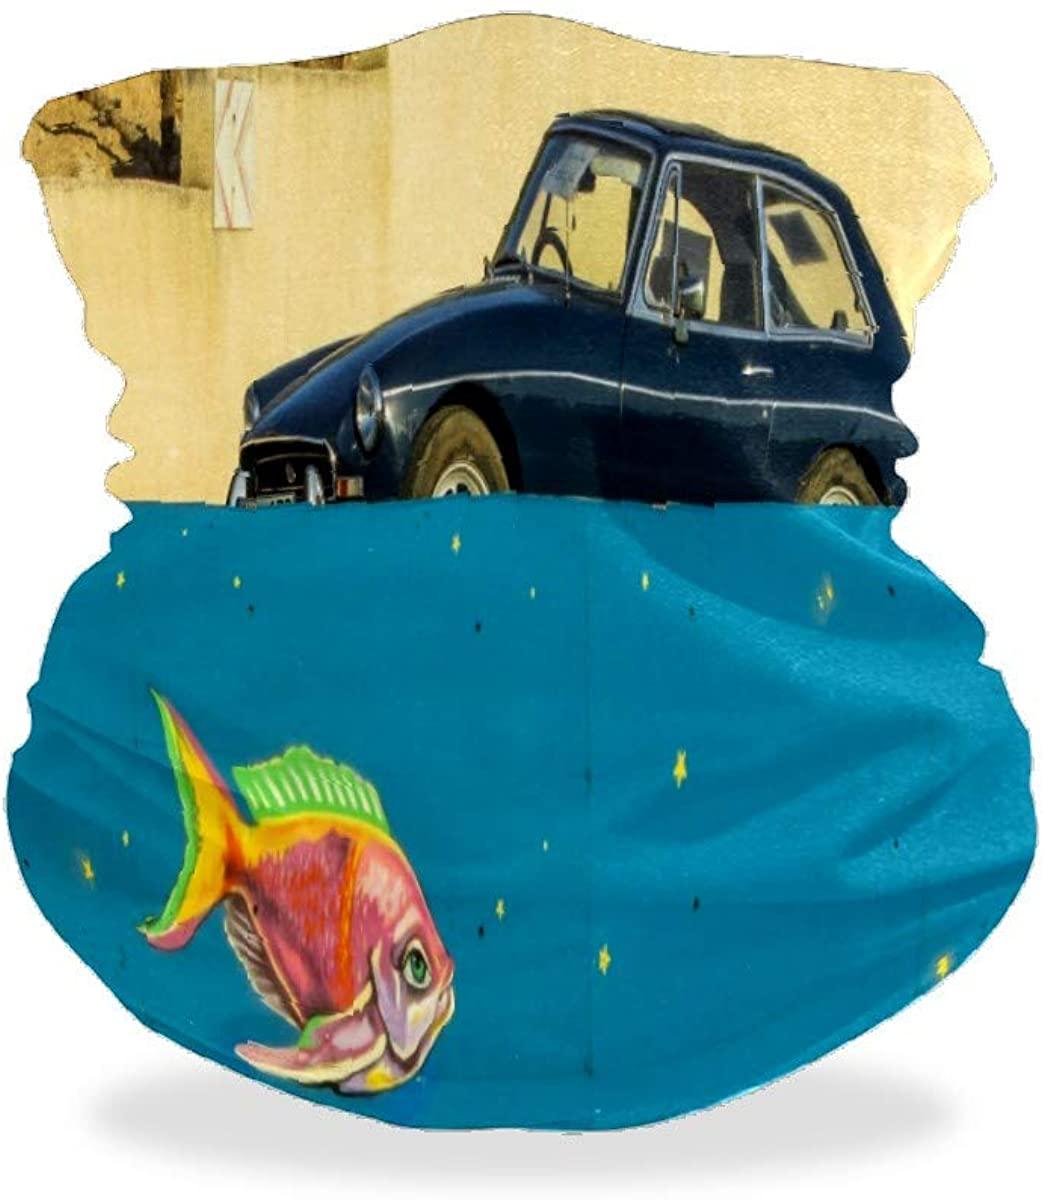 Old Car Fish Fantasy Graffiti Unisex Mouth Mask Bandanas Face Fover Nose Scarf Mask Balaclavas Headbands Hairband Neck Gaiter for Running Shopping Walking Motorcycling Sports Against UV Light Mask